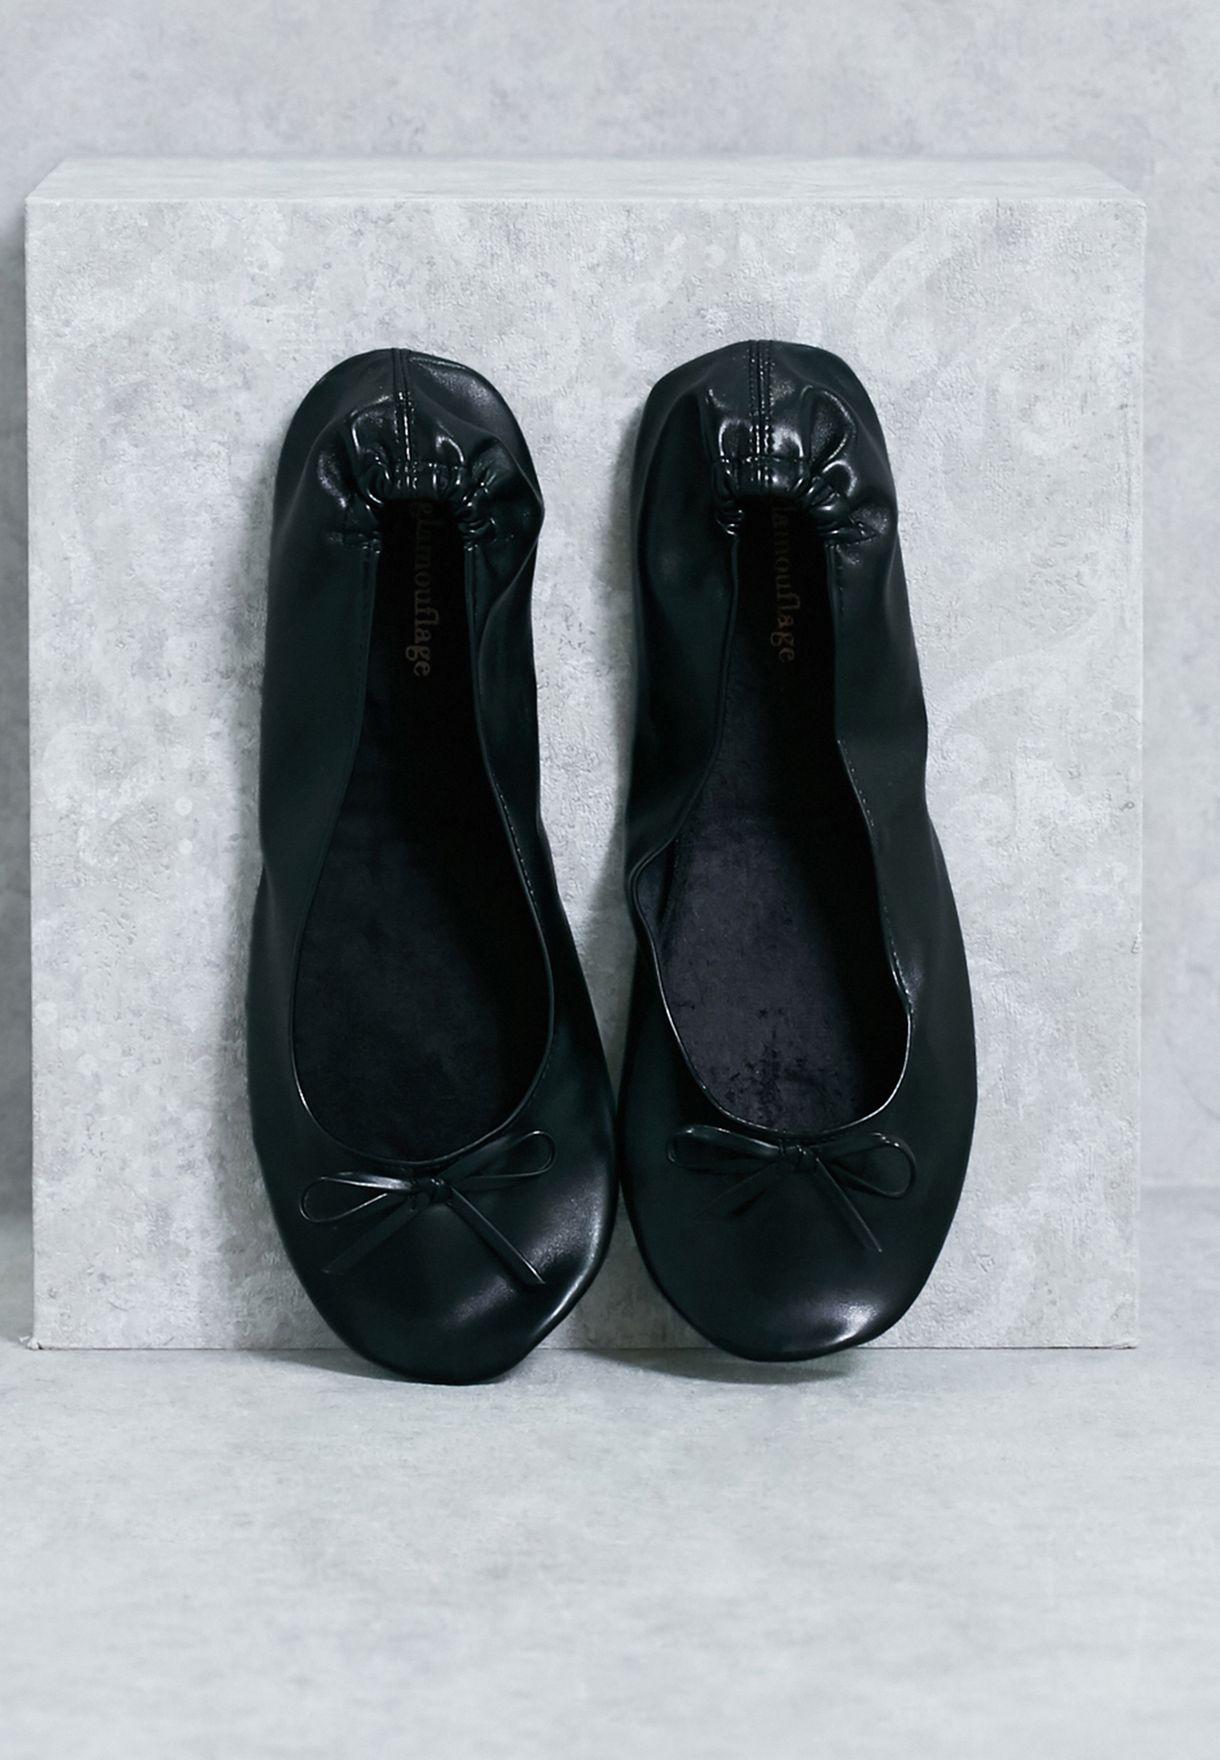 حذاء مرن قابل للطي